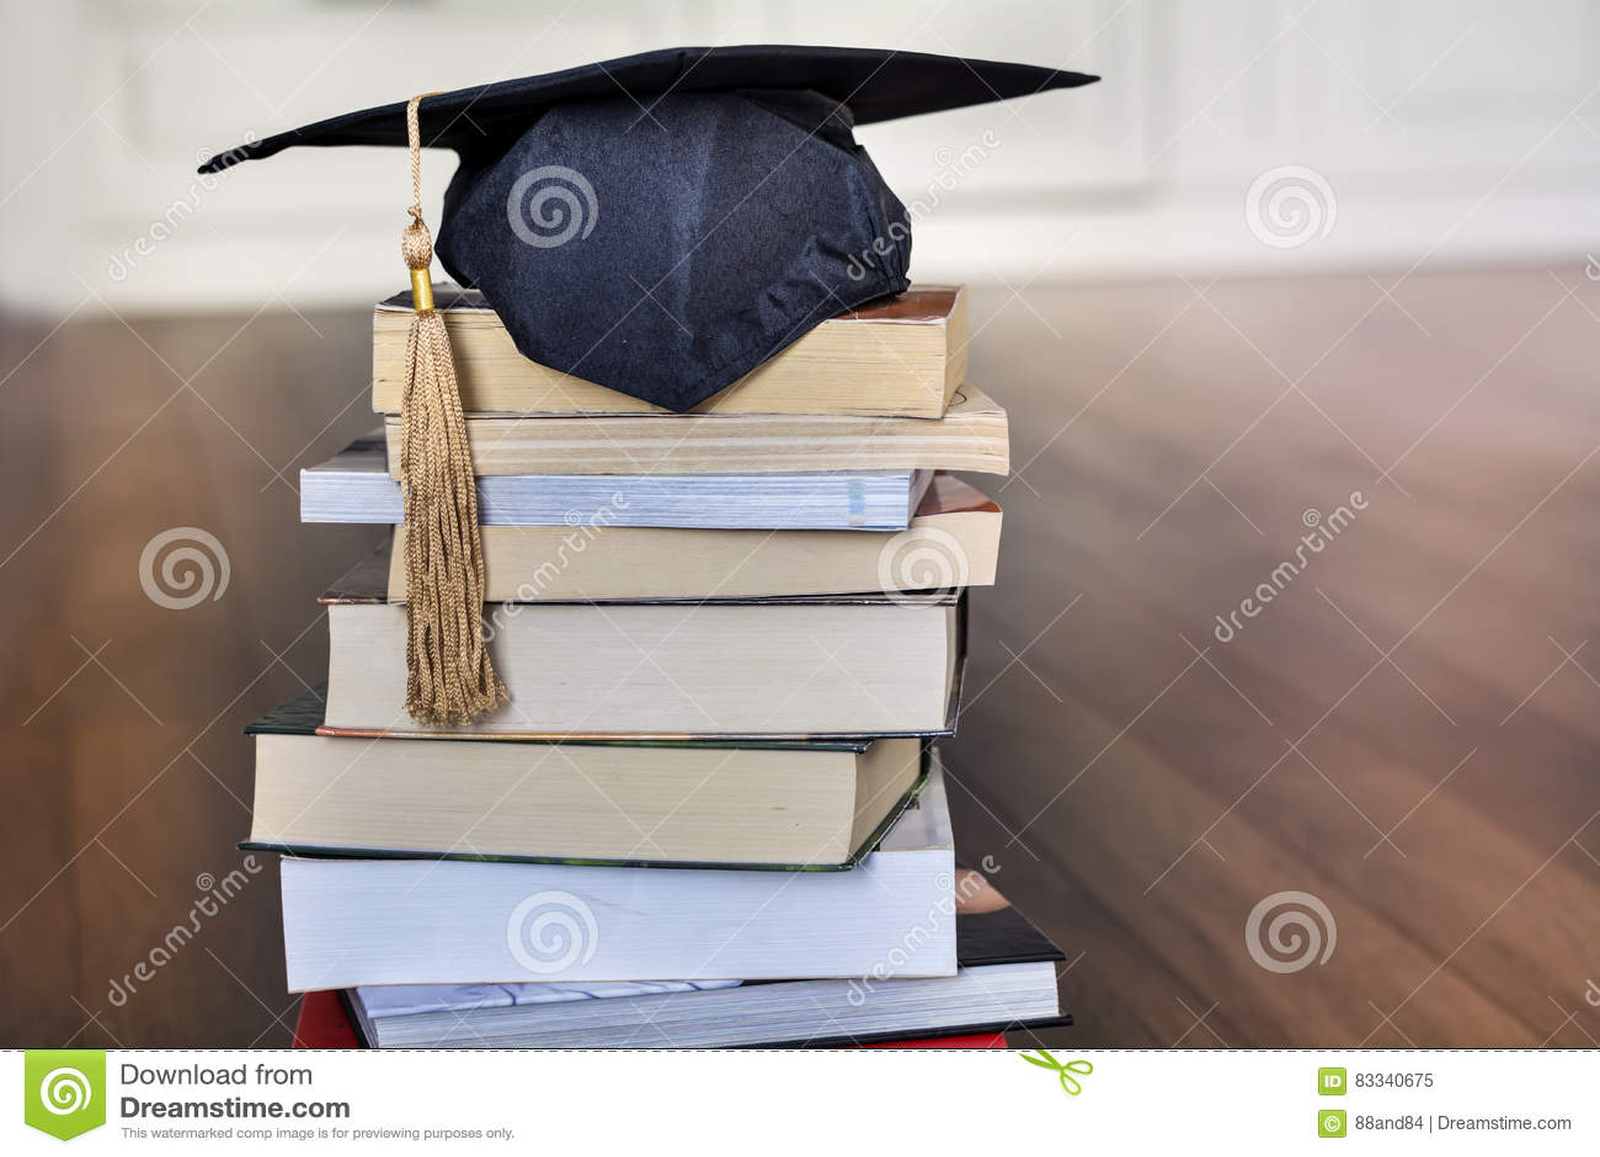 Graduation hat on books